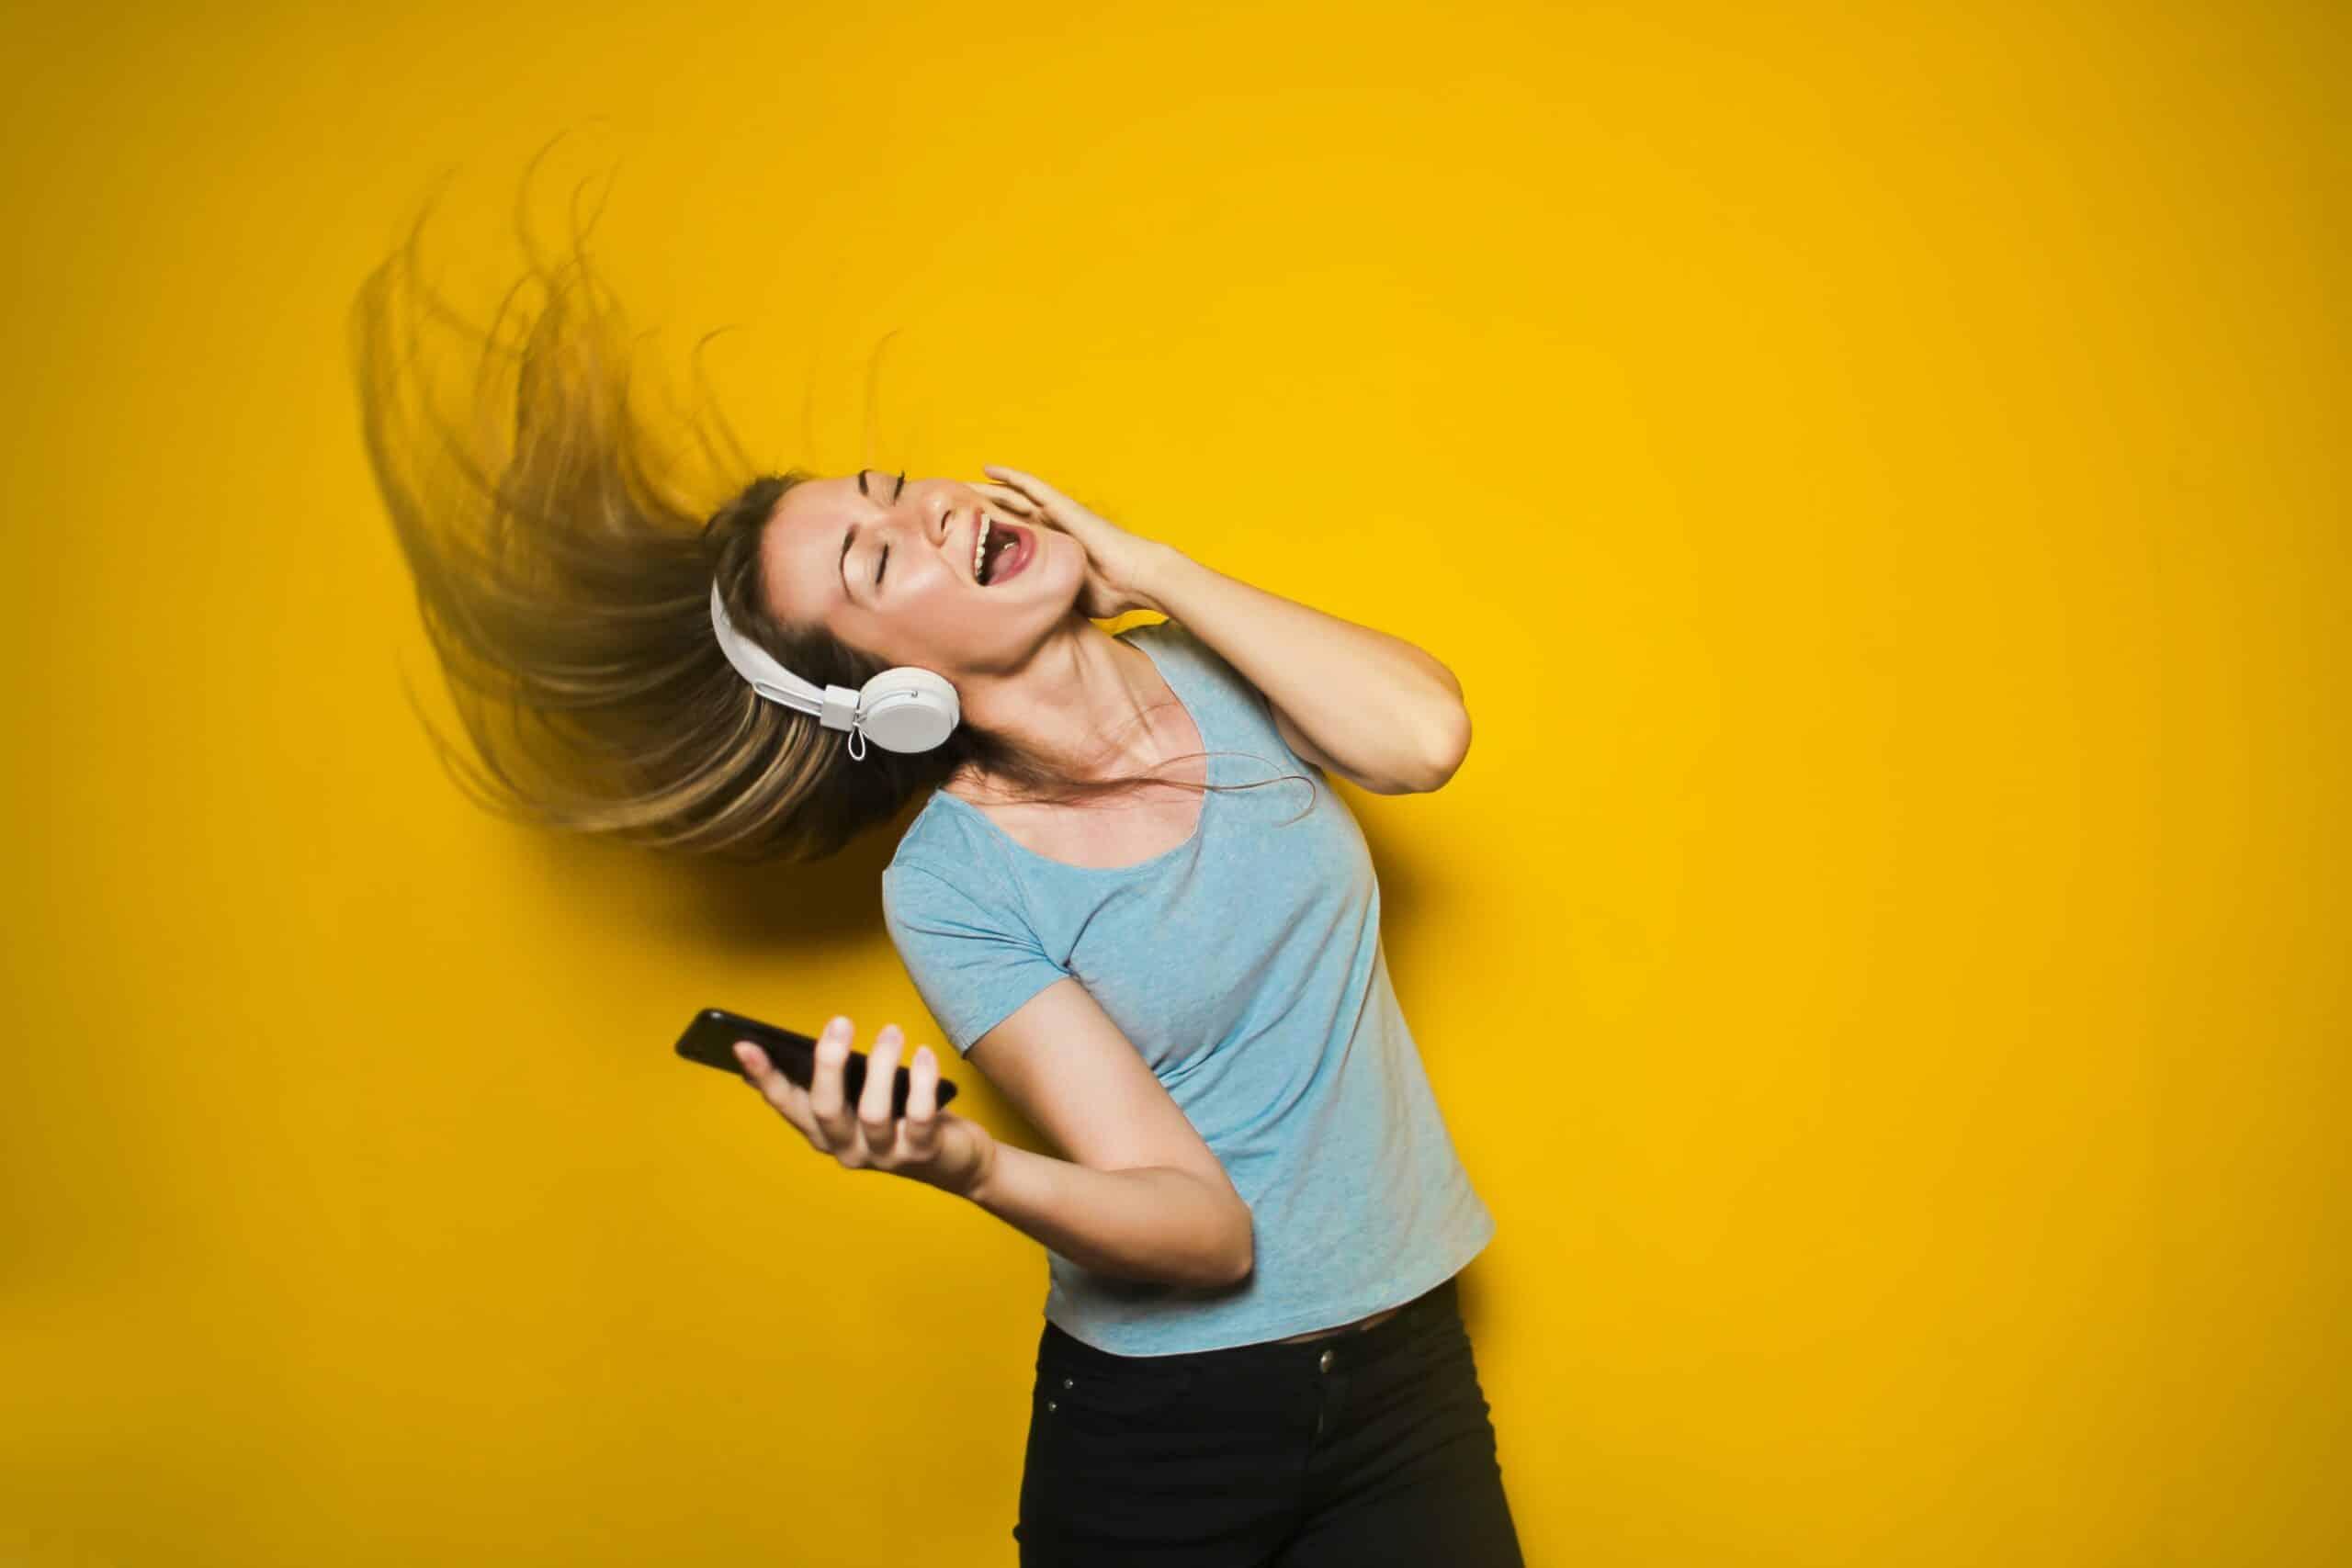 Earphones Noise Reducing Technology Image